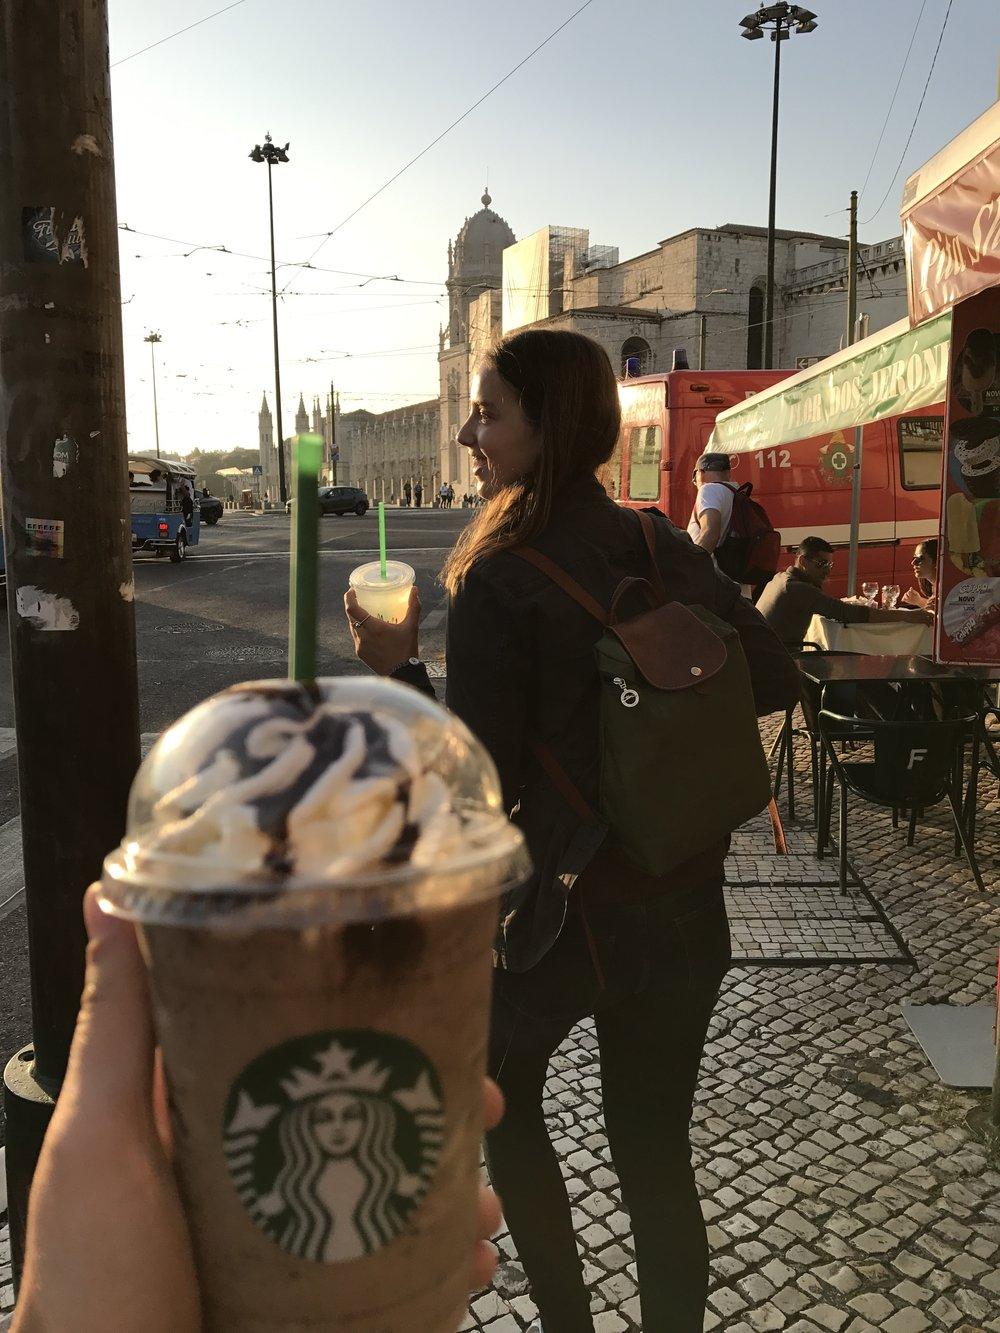 We found Starbucks!